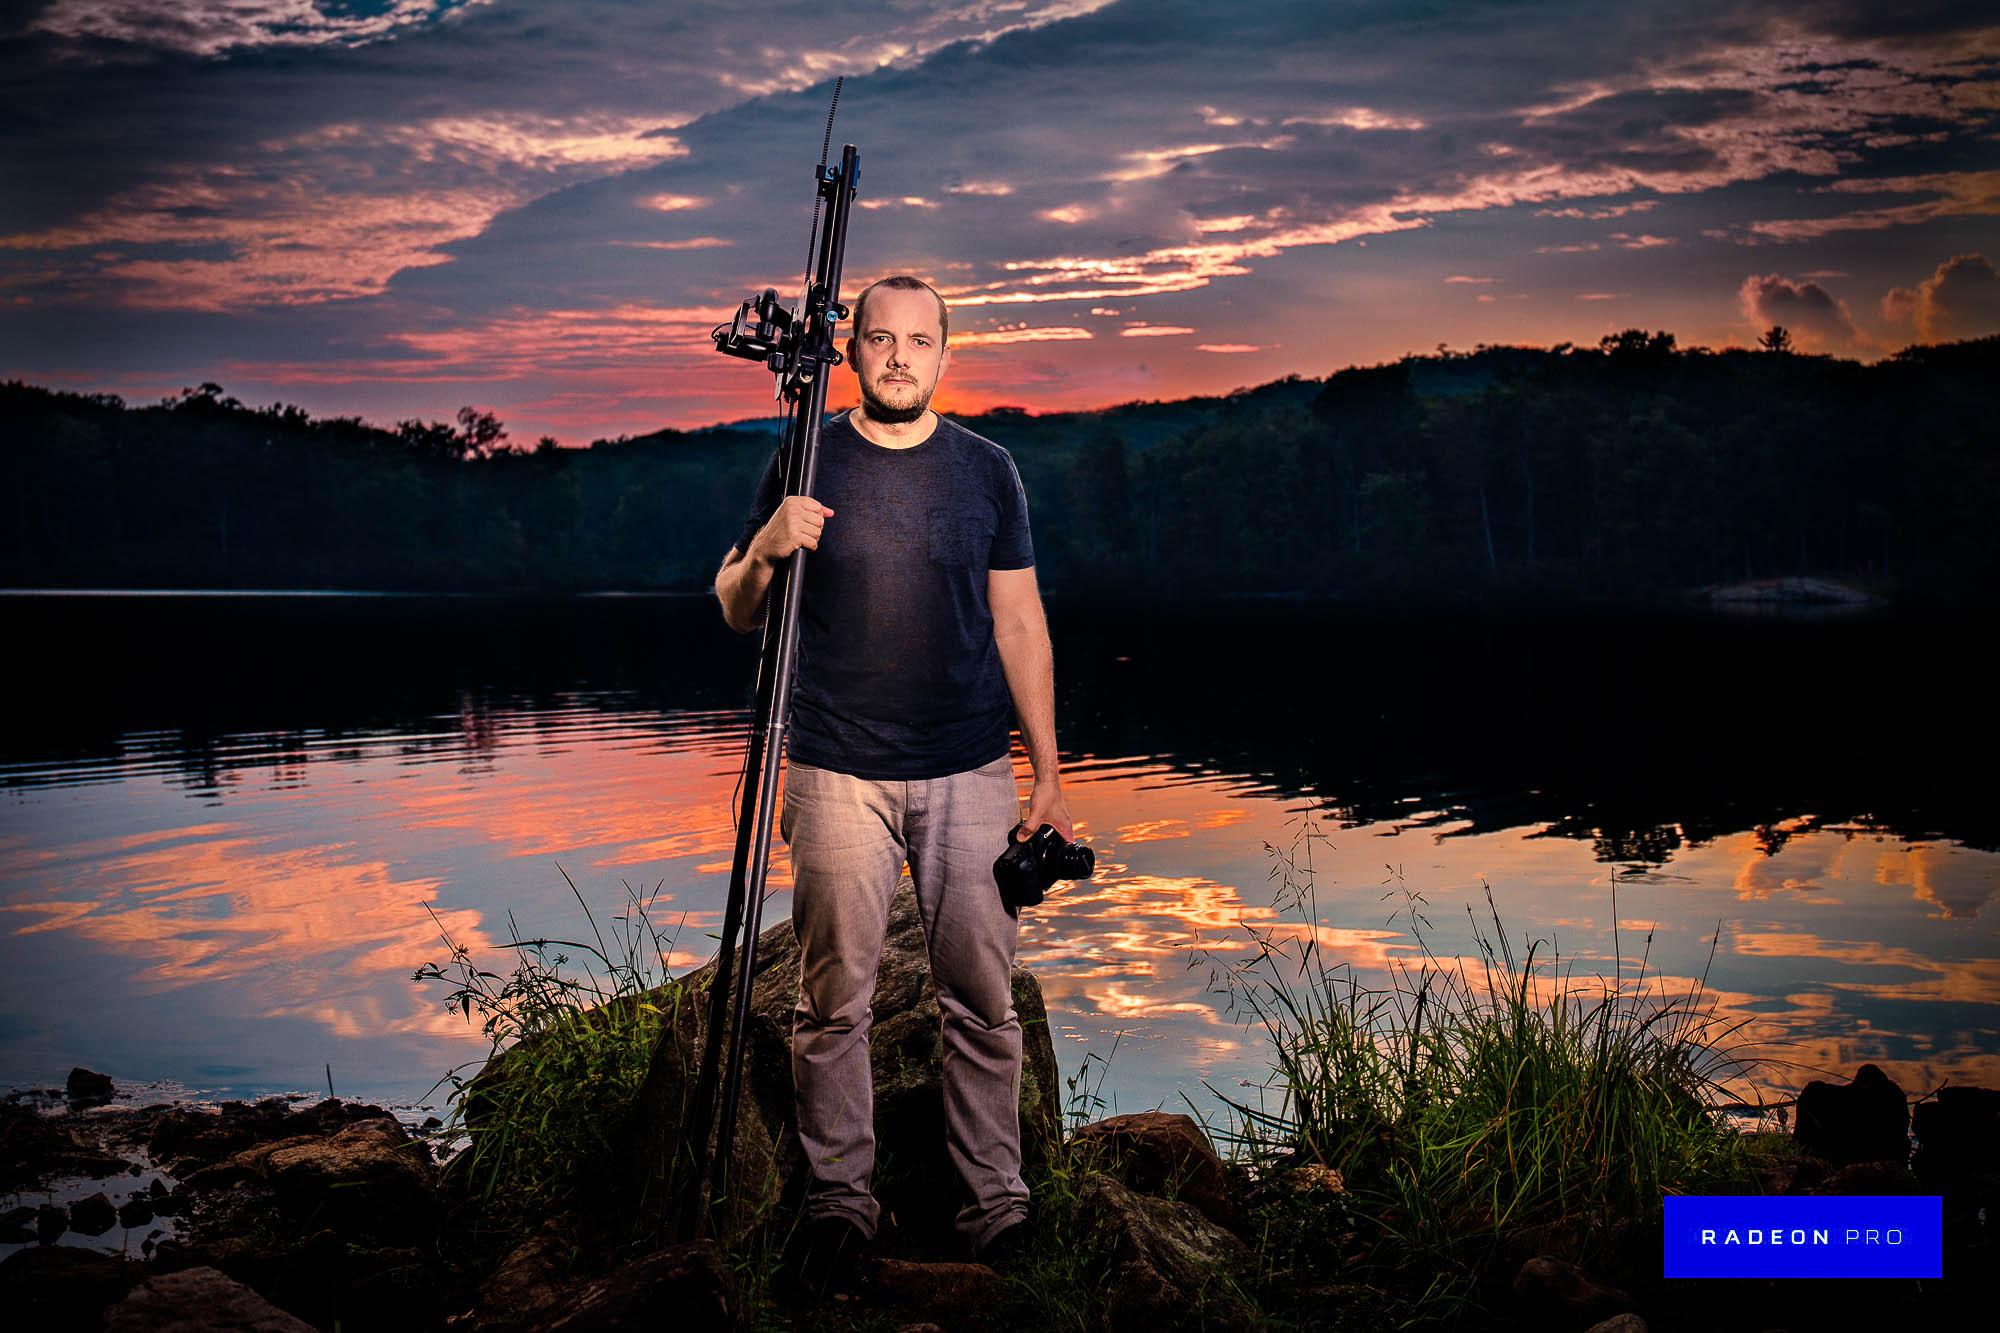 Tim Platt - Landscape with fisherman